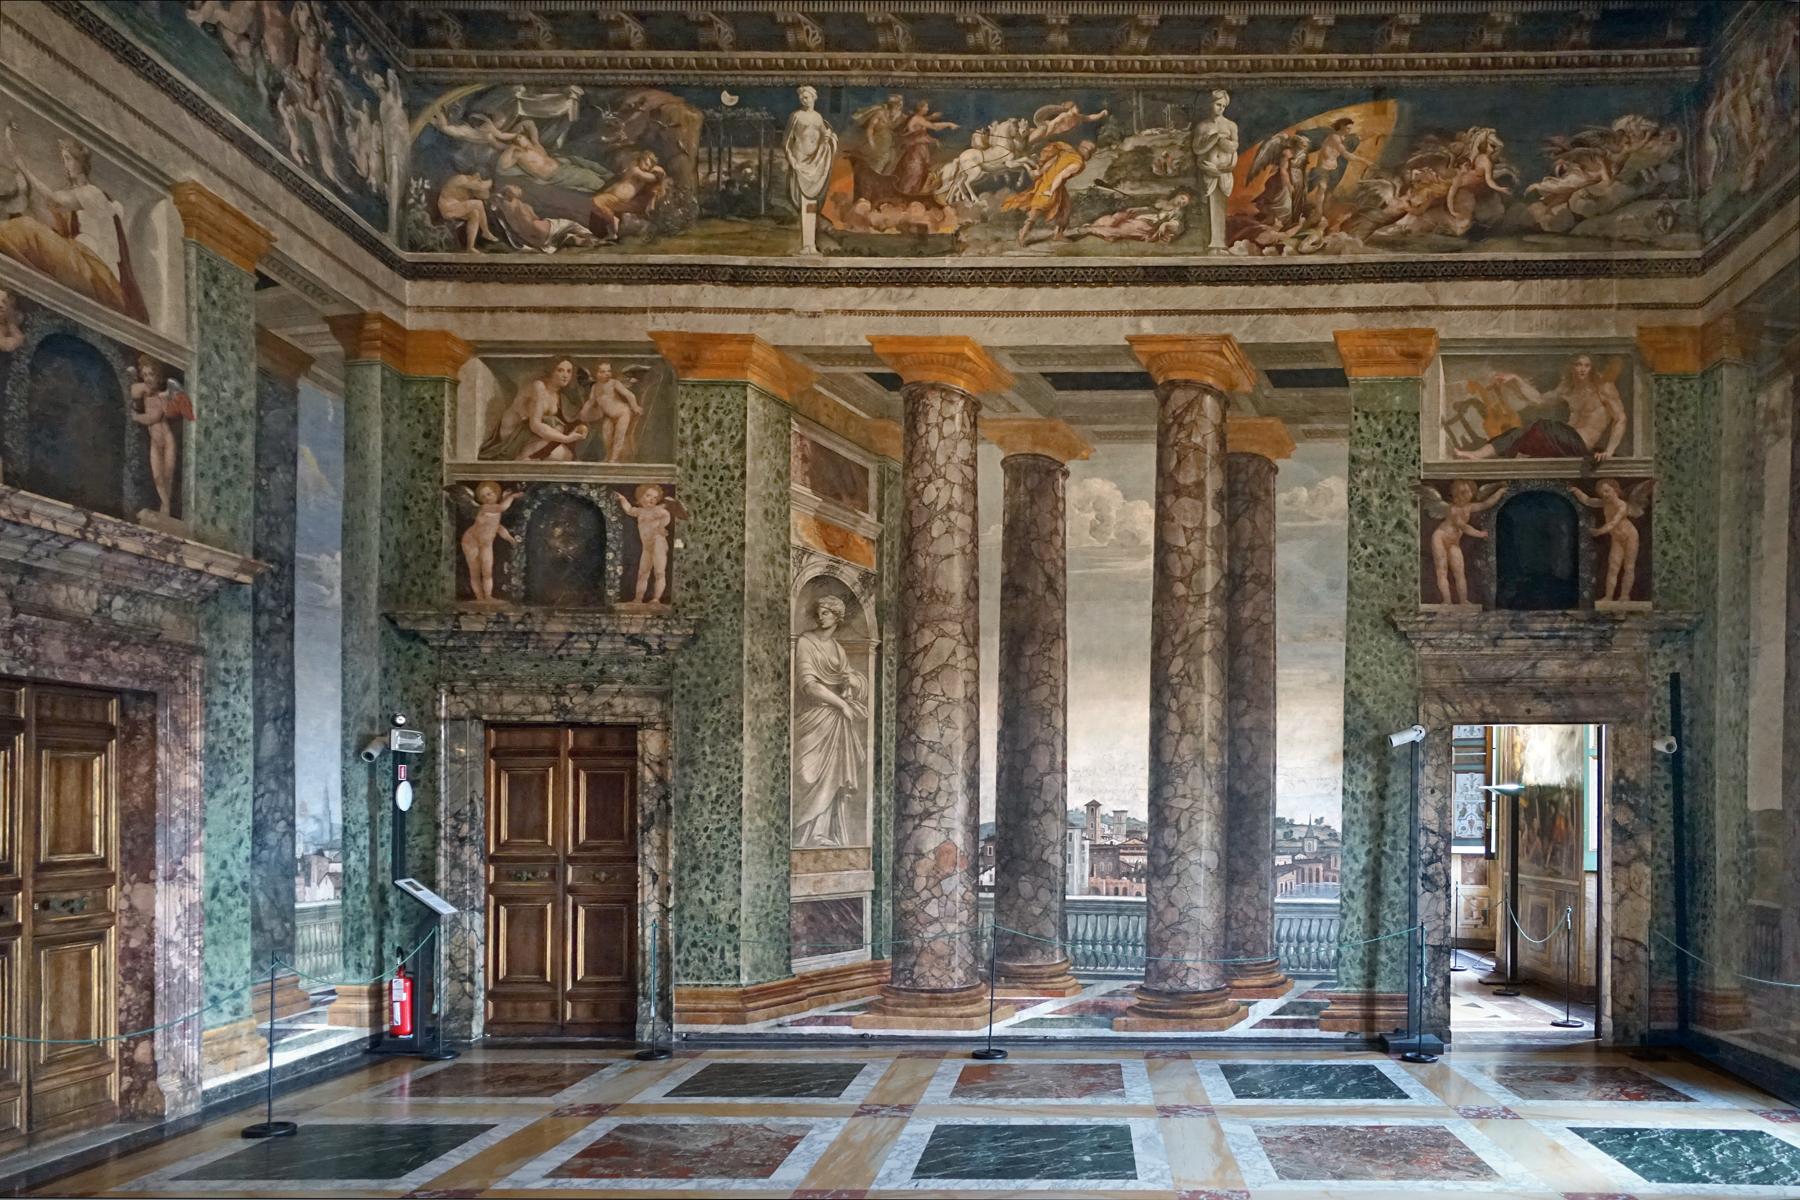 FileLe salon des Perspectives Villa Farnesina Rome 34242676046jpg  Wikimedia Commons